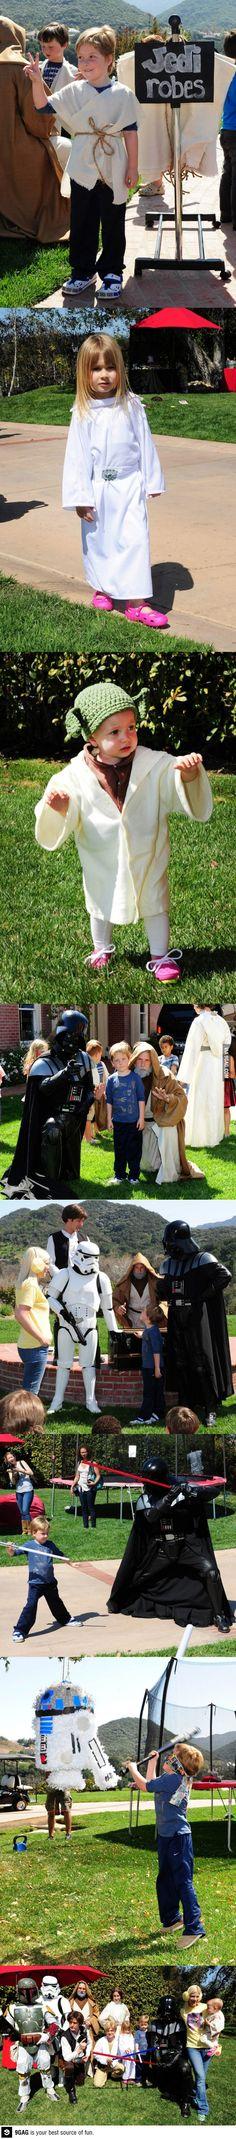 Amazing Star Wars themed birthday party!